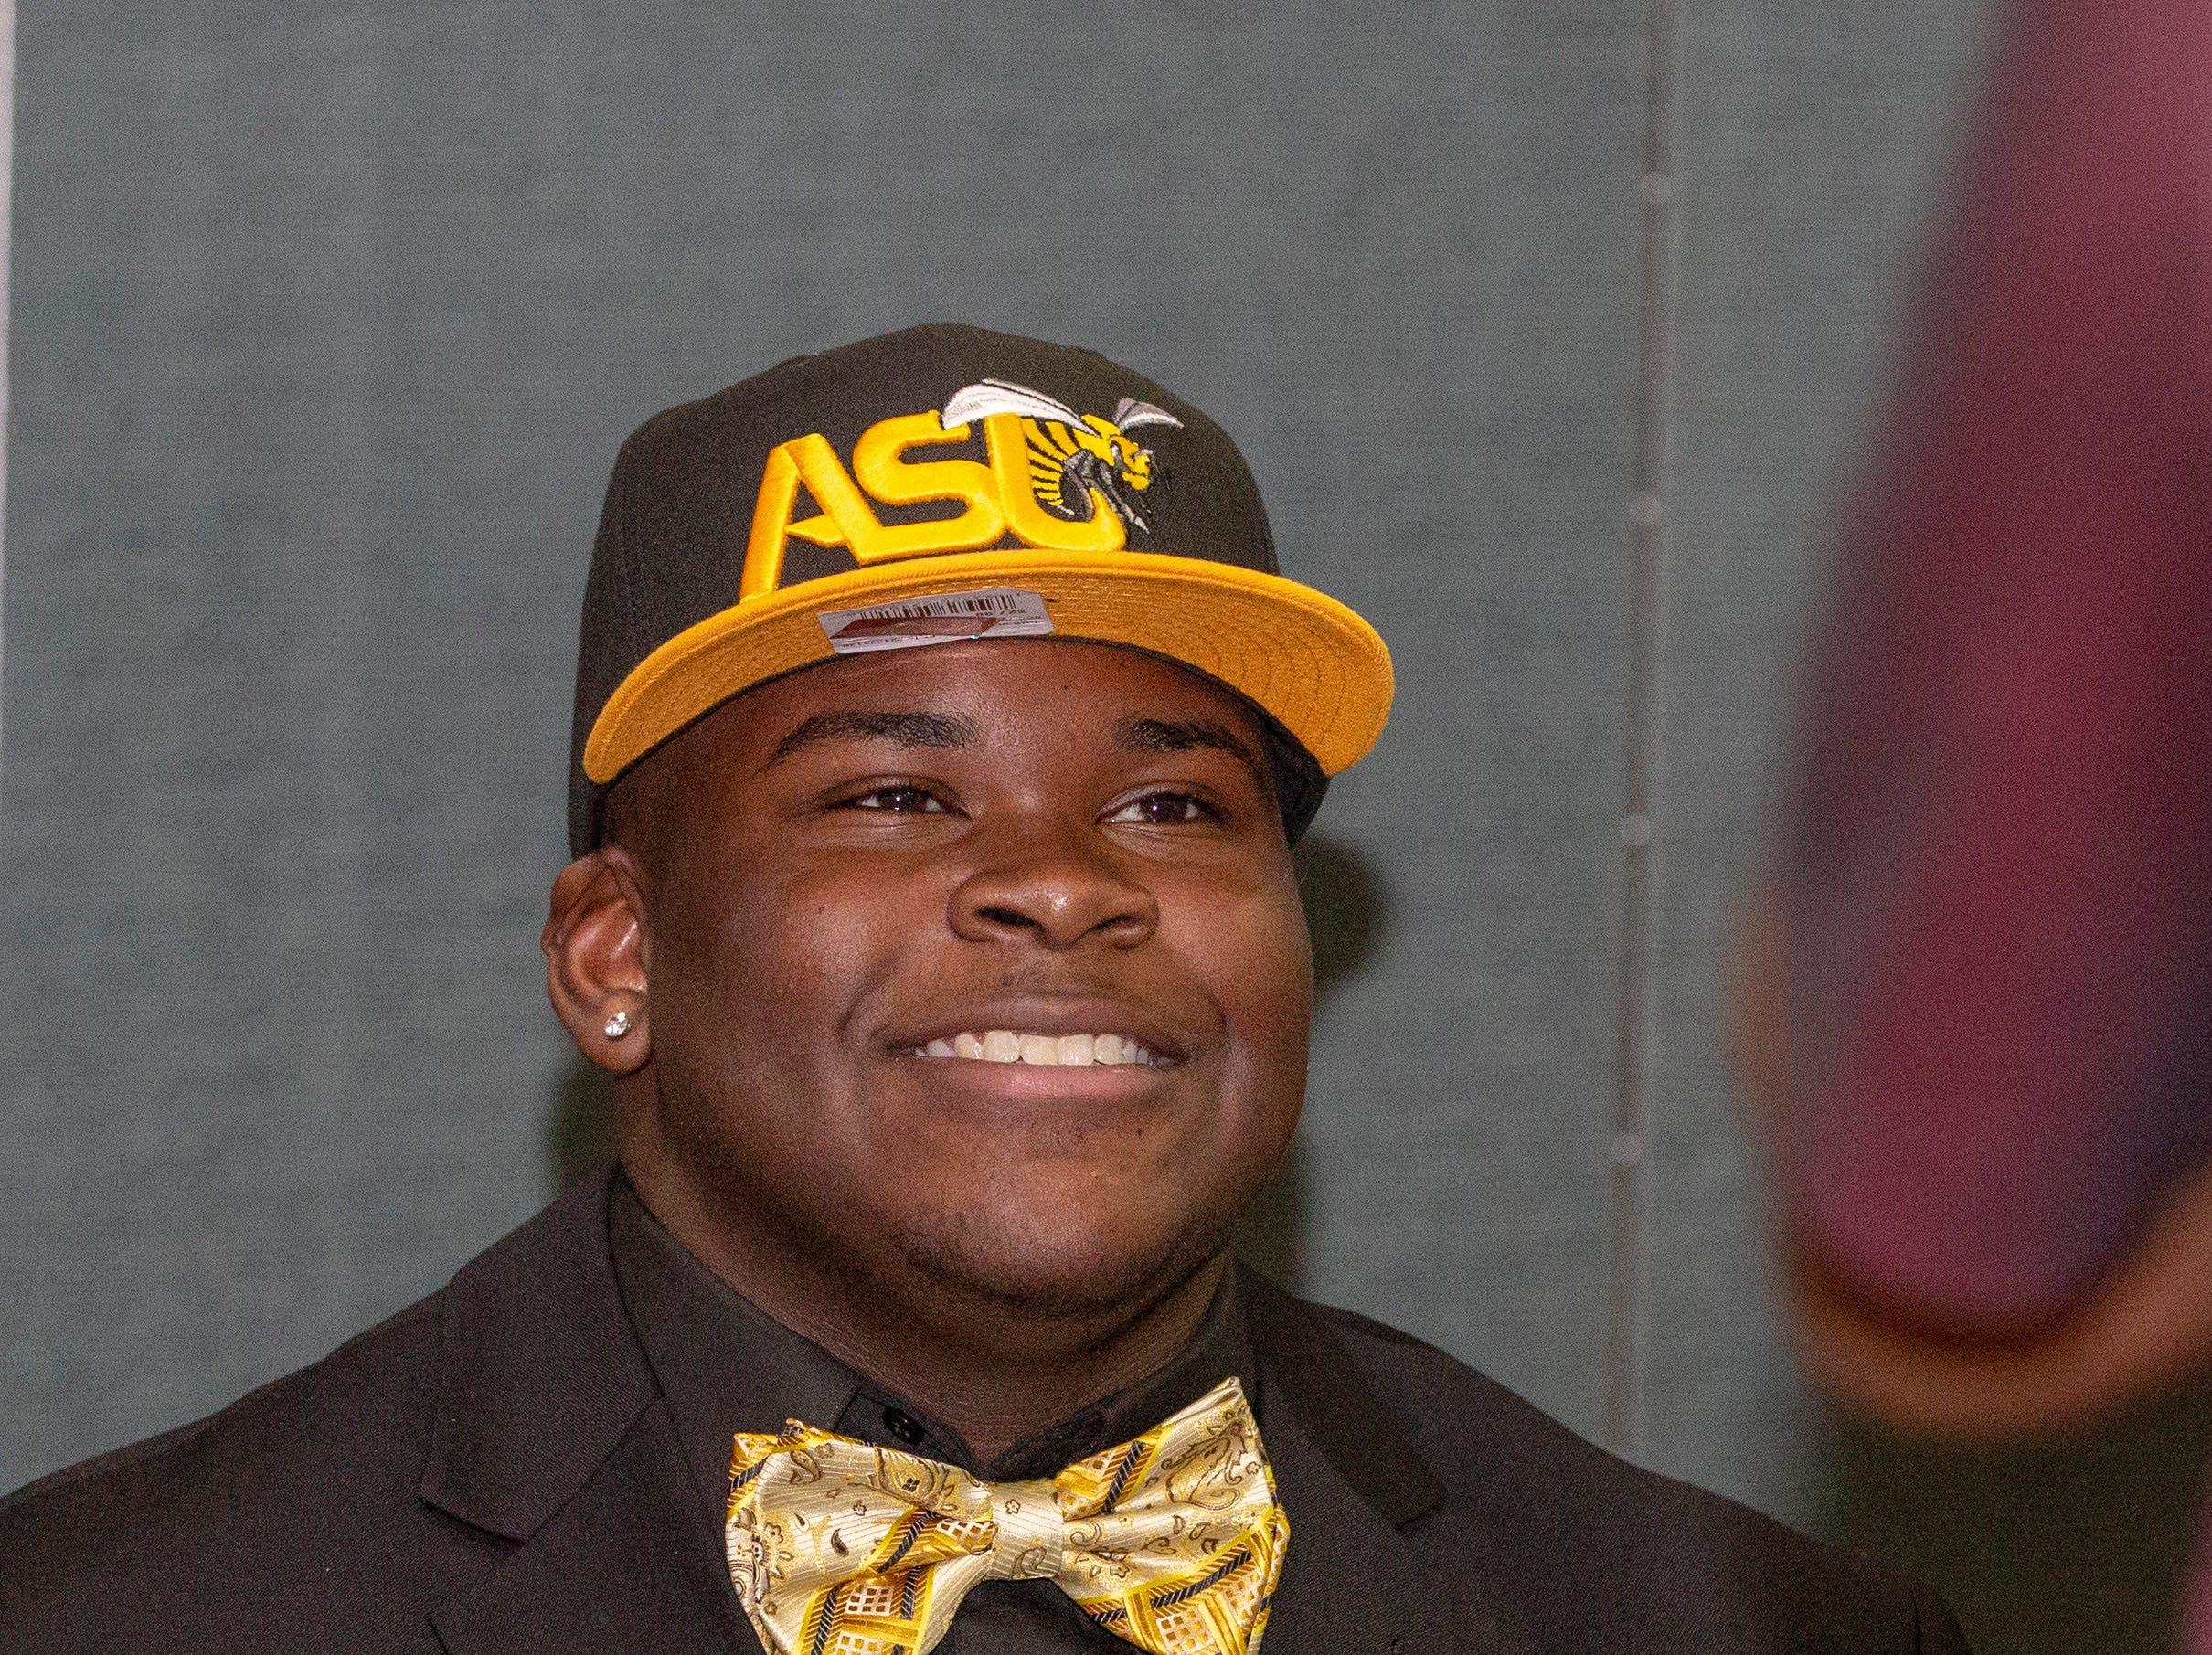 Kavarius Thomas, a Jeff Davis football player, will walk on at Alabama State University.